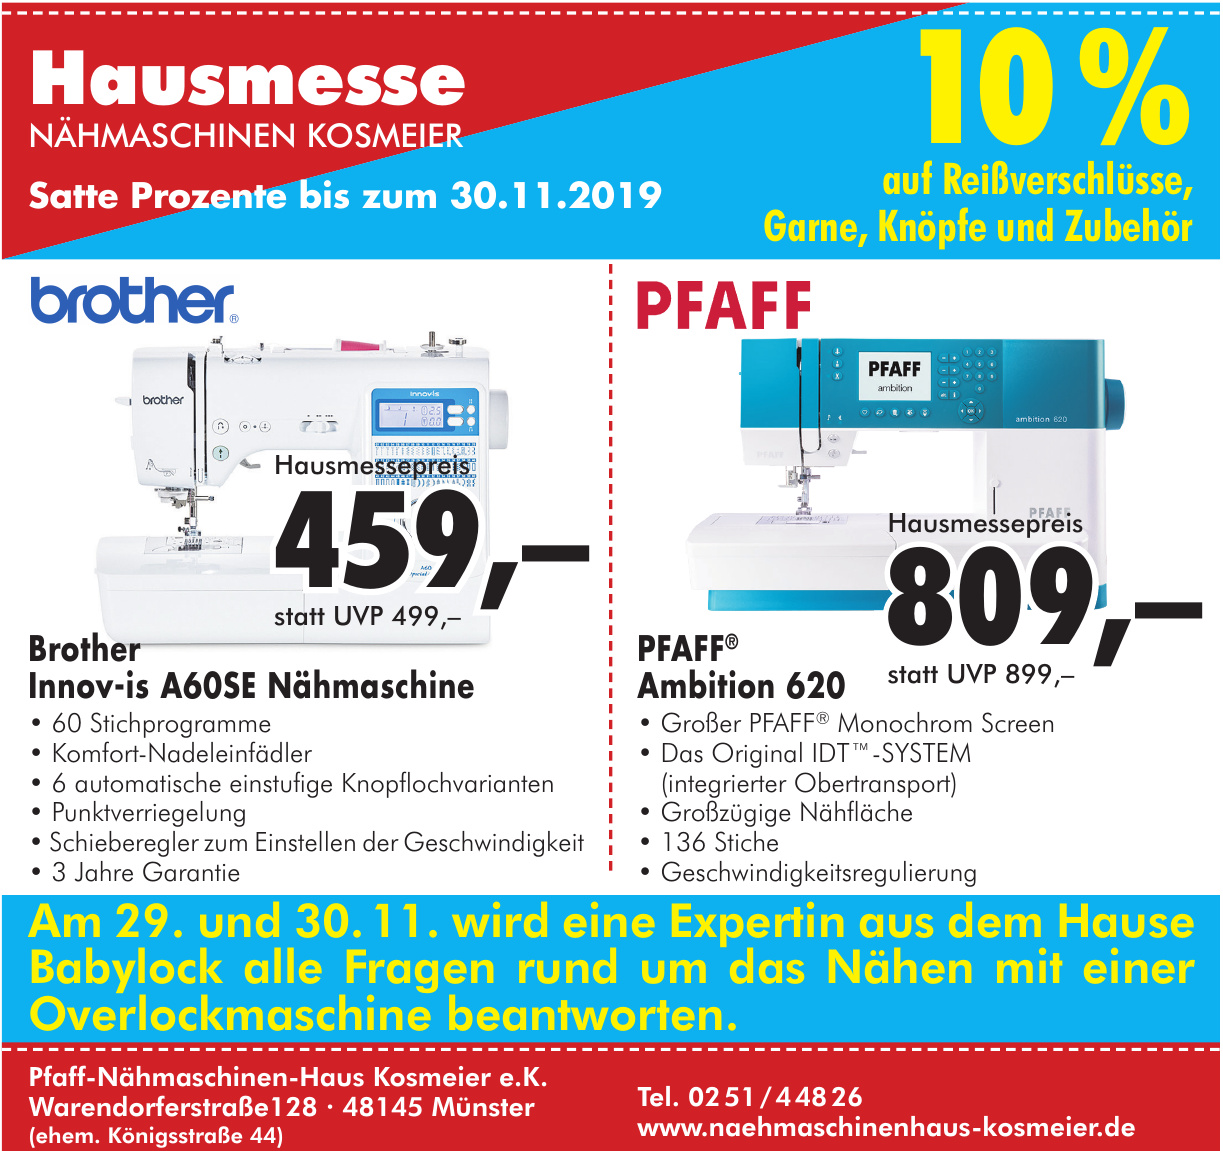 Pfaff-Nähmaschinen-Haus Kosmeier e.K.